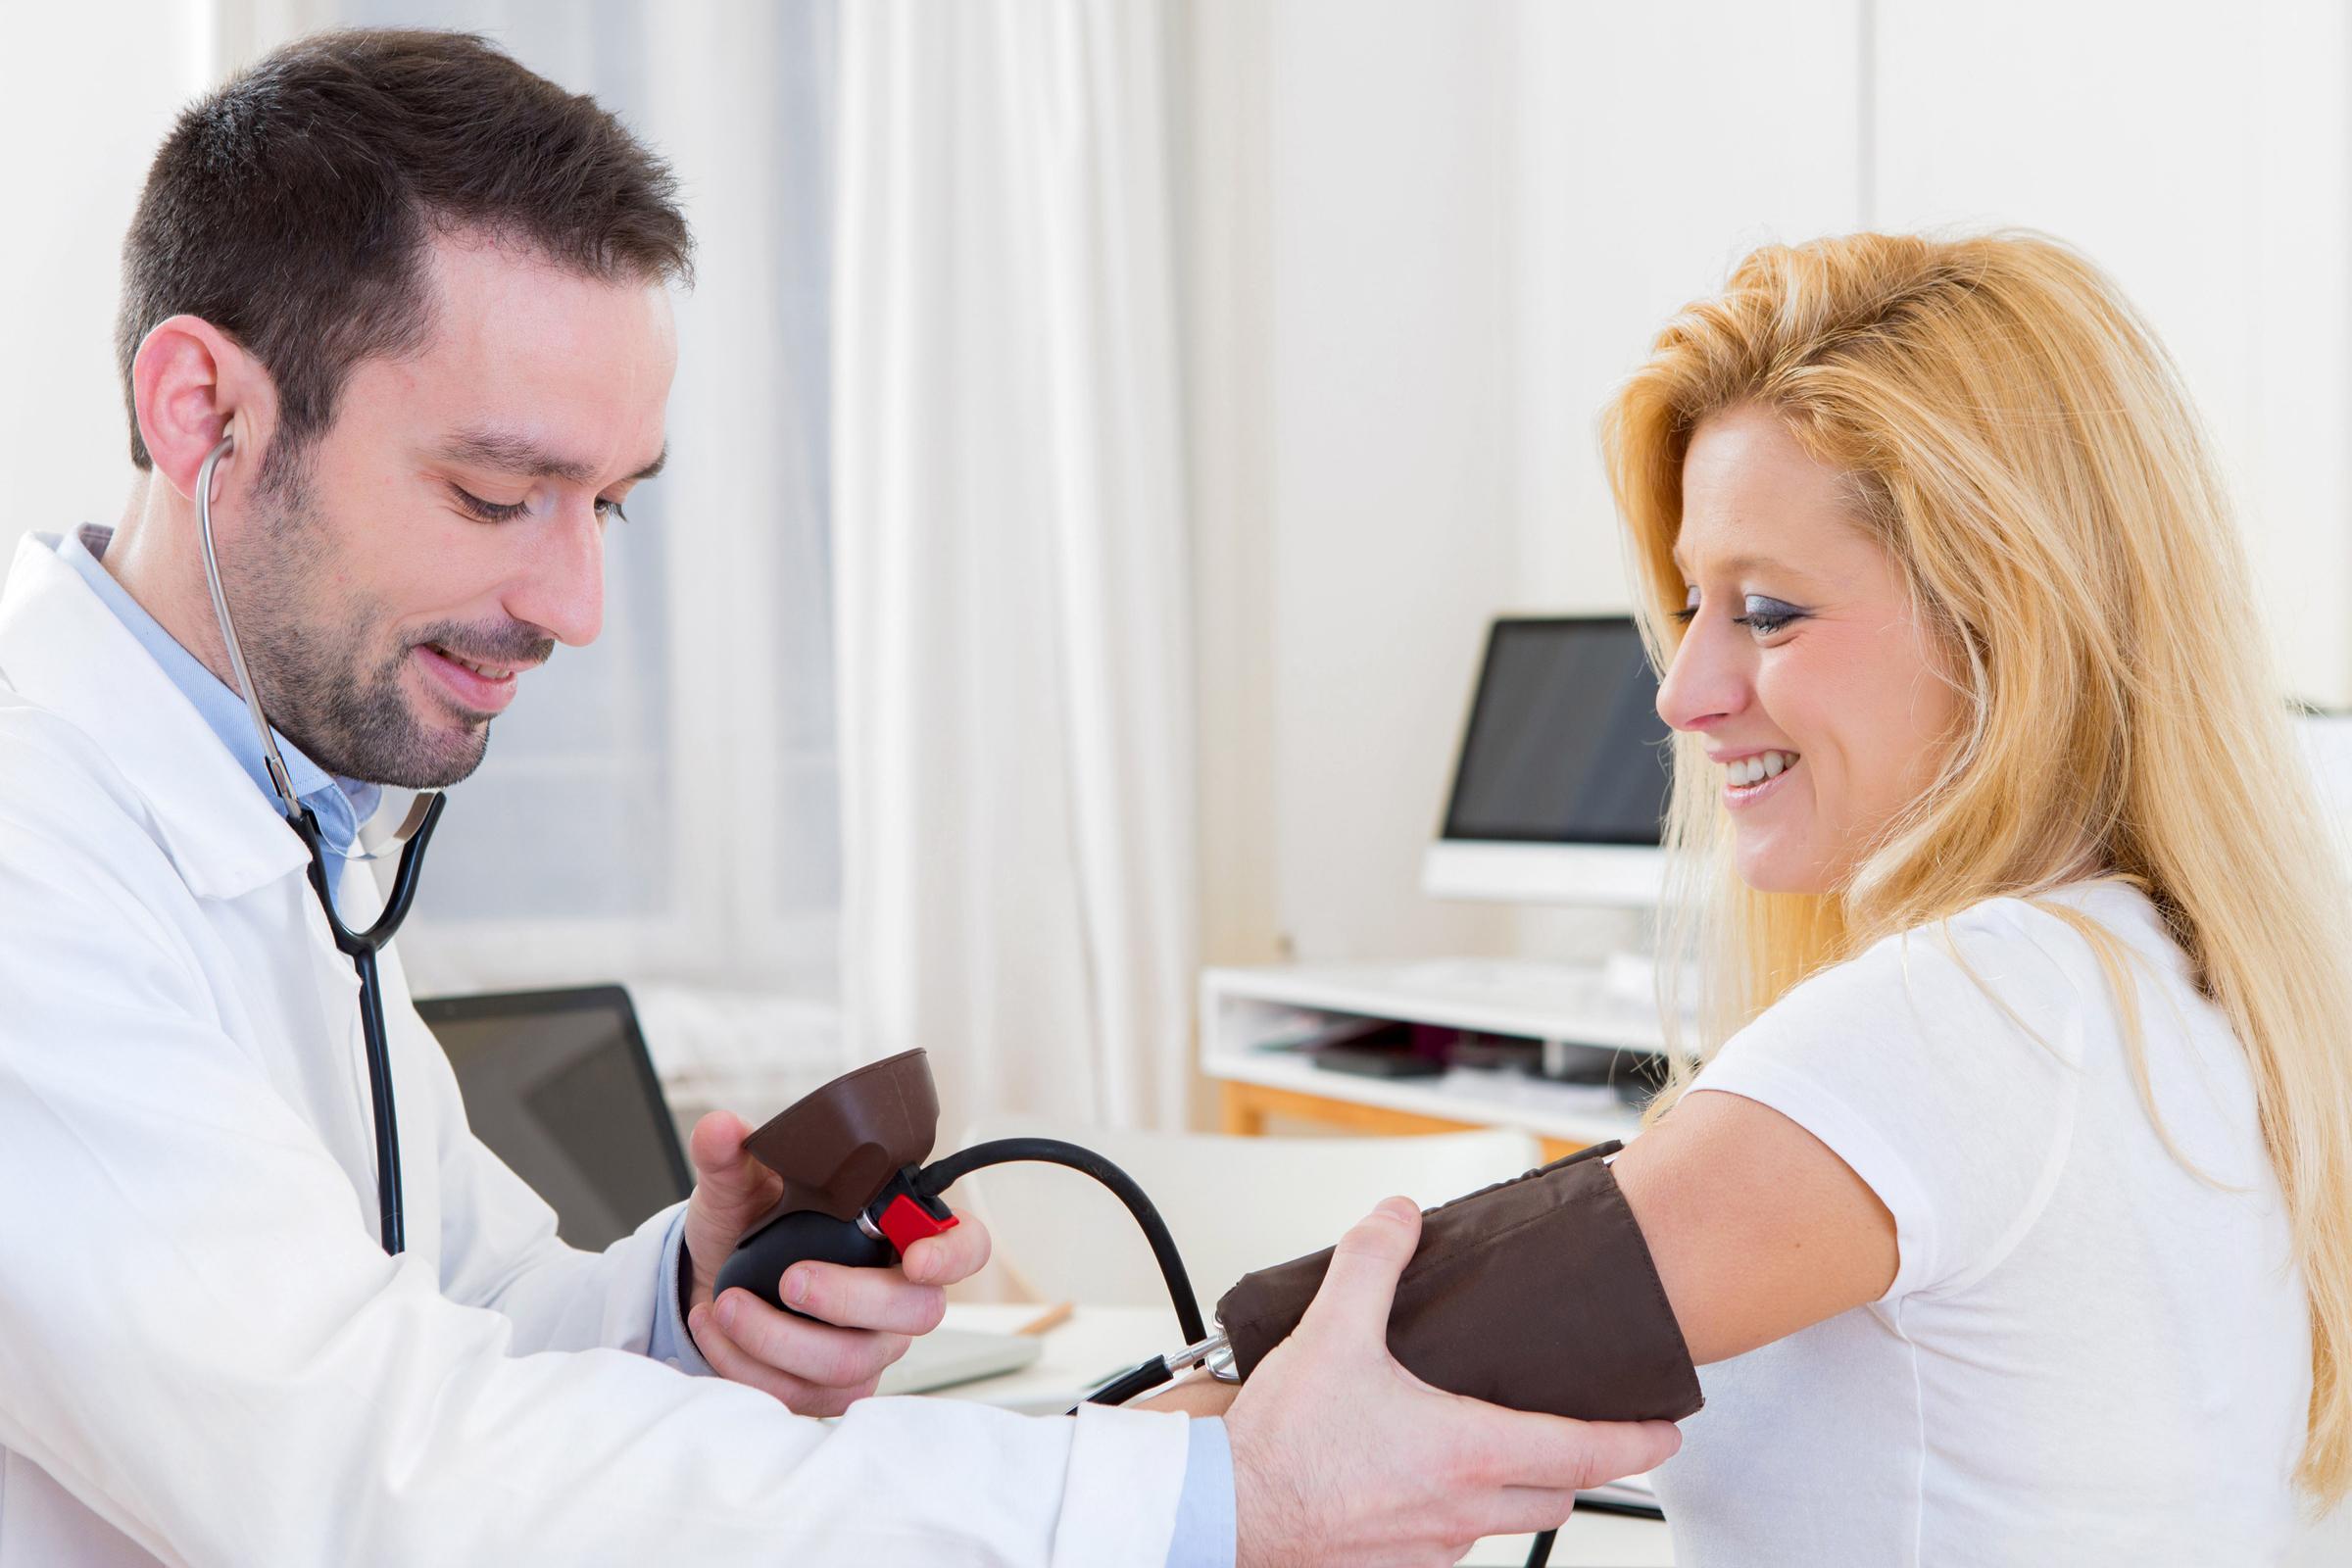 magas vérnyomás ápoló nőnél